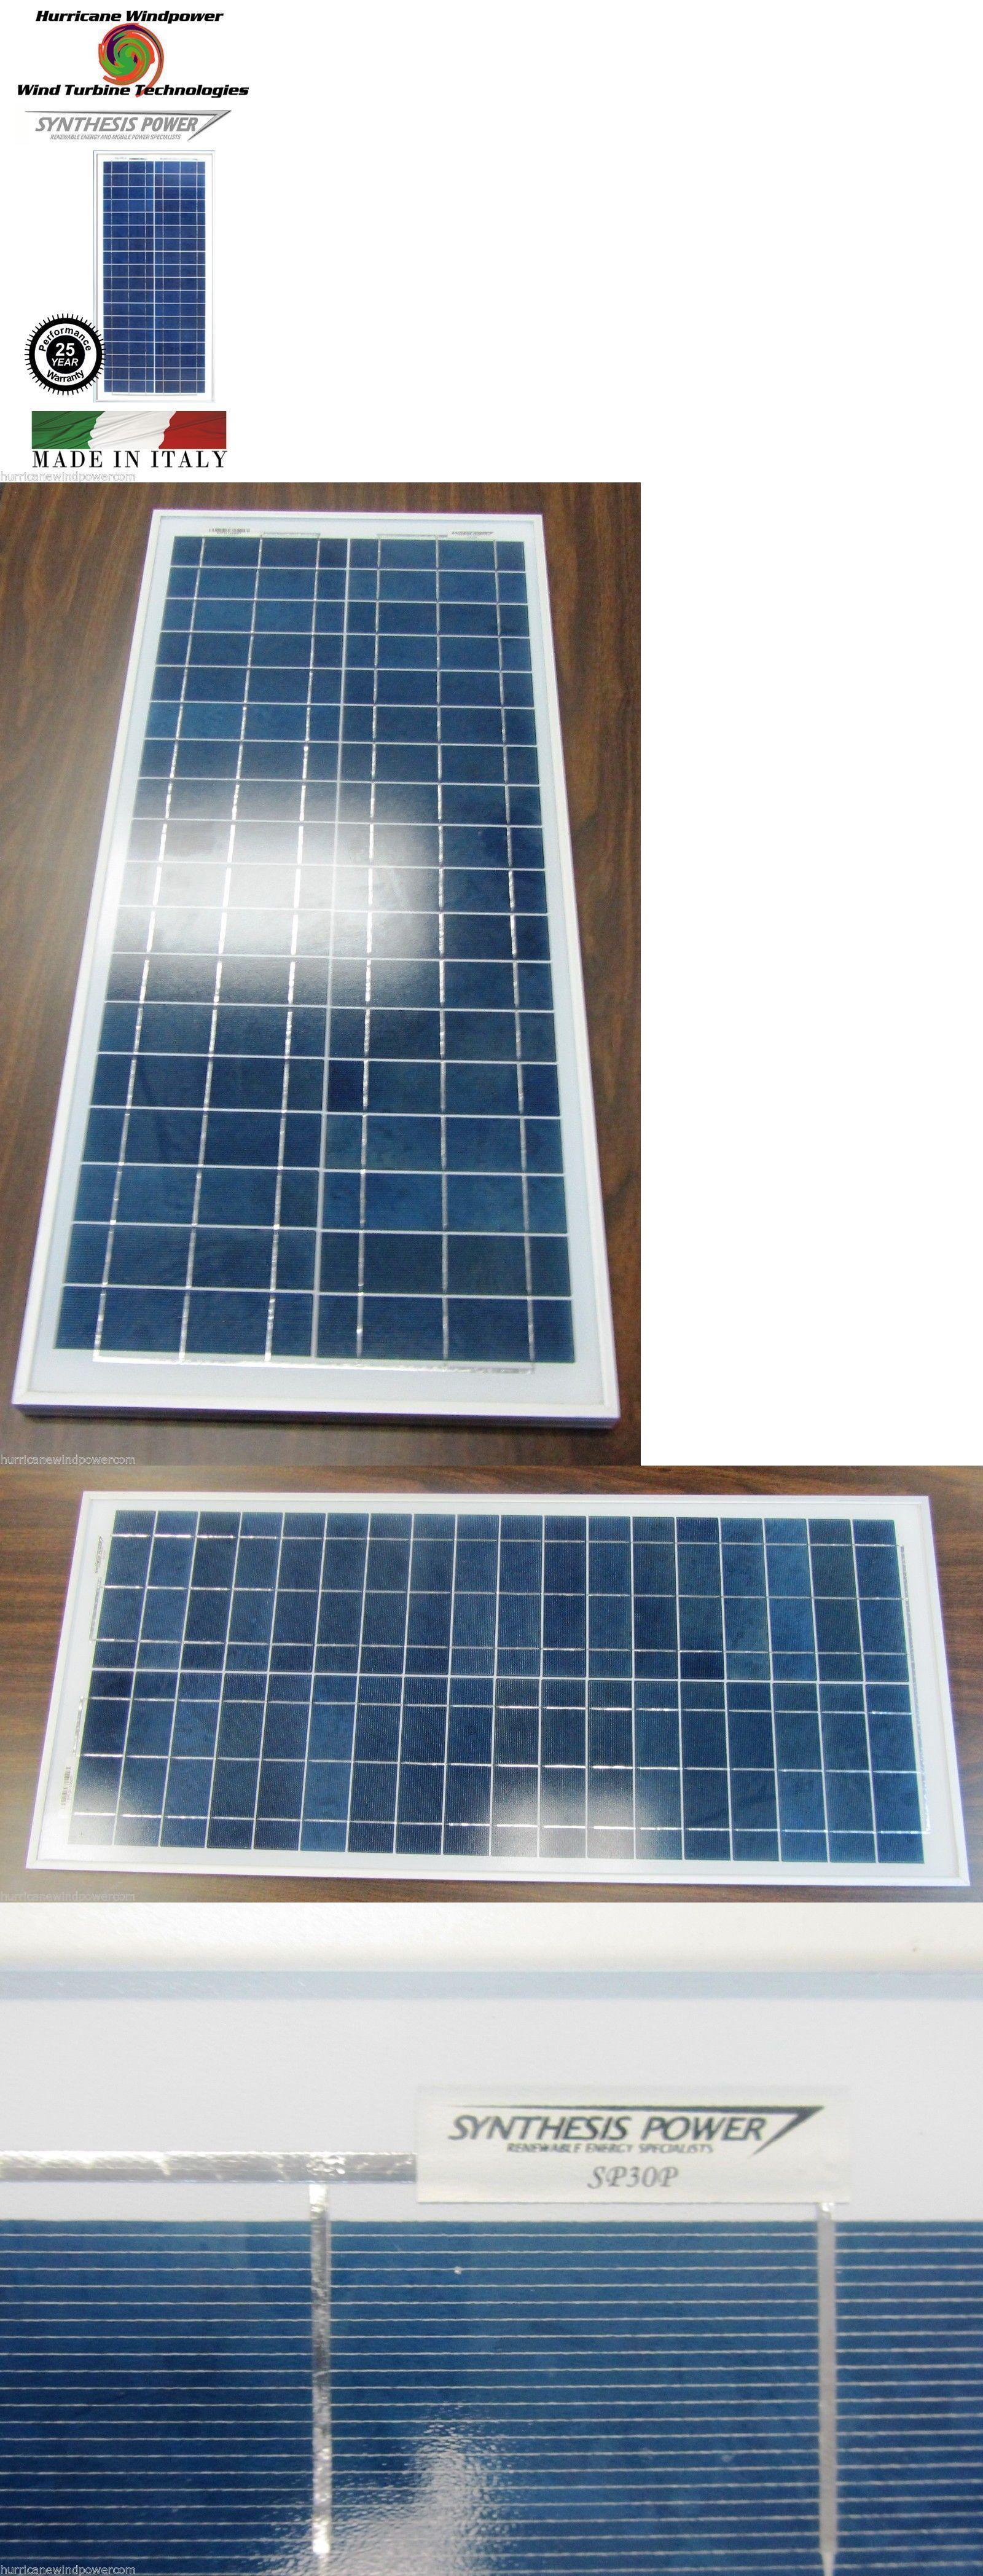 Alternative And Solar Energy 41979 30w Peimar Synthesis 12v Poly Crystalline Solar Panel 30 Watt Off Grid Rv Marine Buy Solar Panels Solar Roof Solar Panel